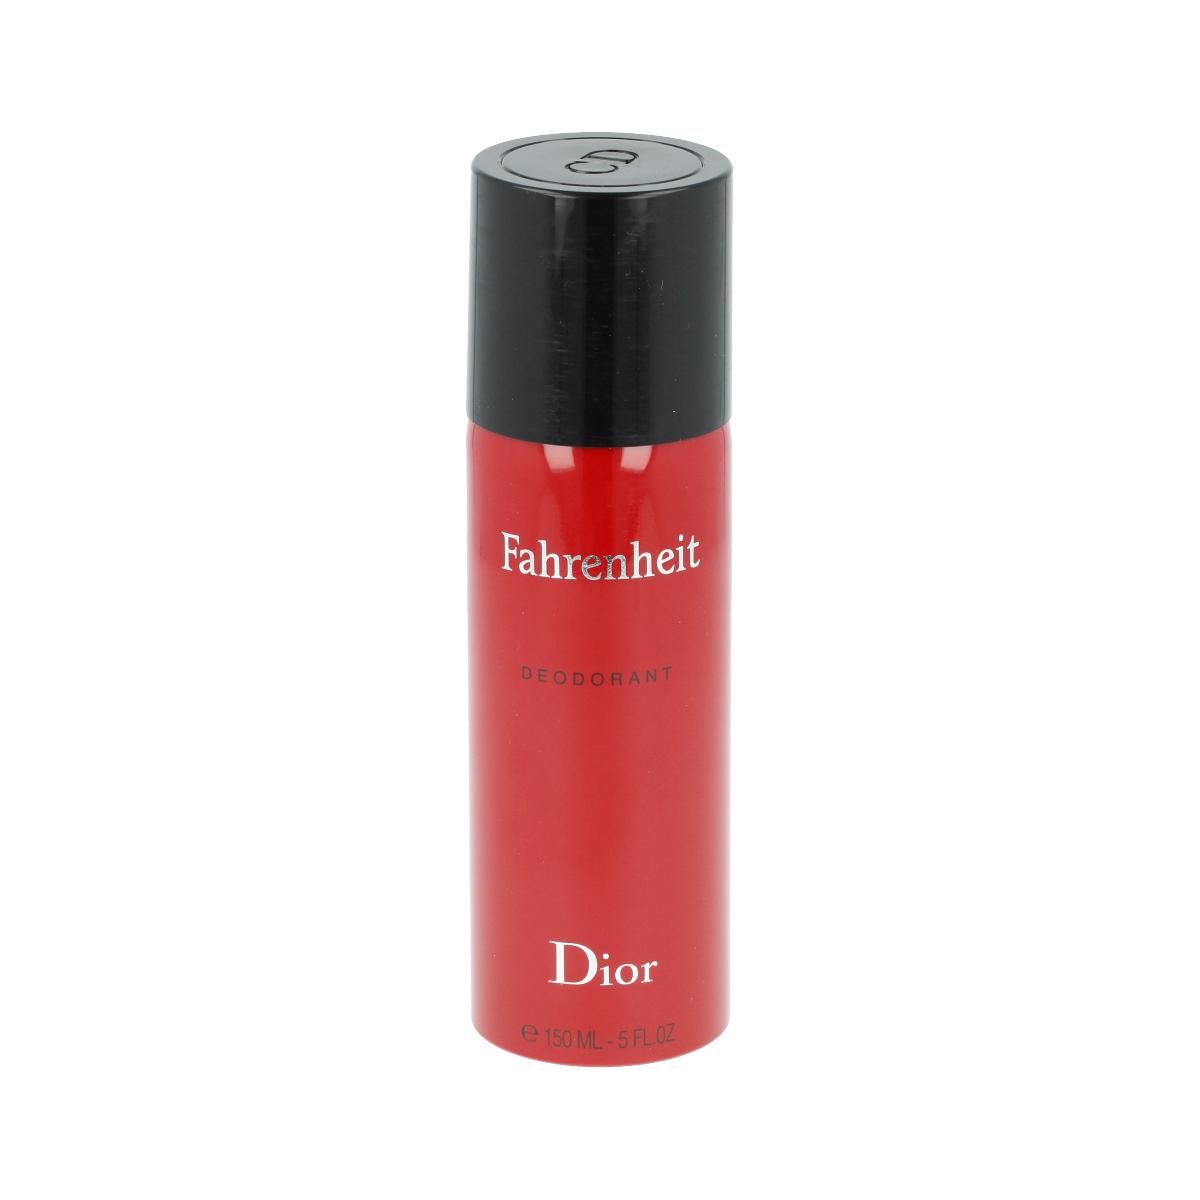 Dior Christian Fahrenheit DEO ve spreji 150 ml M